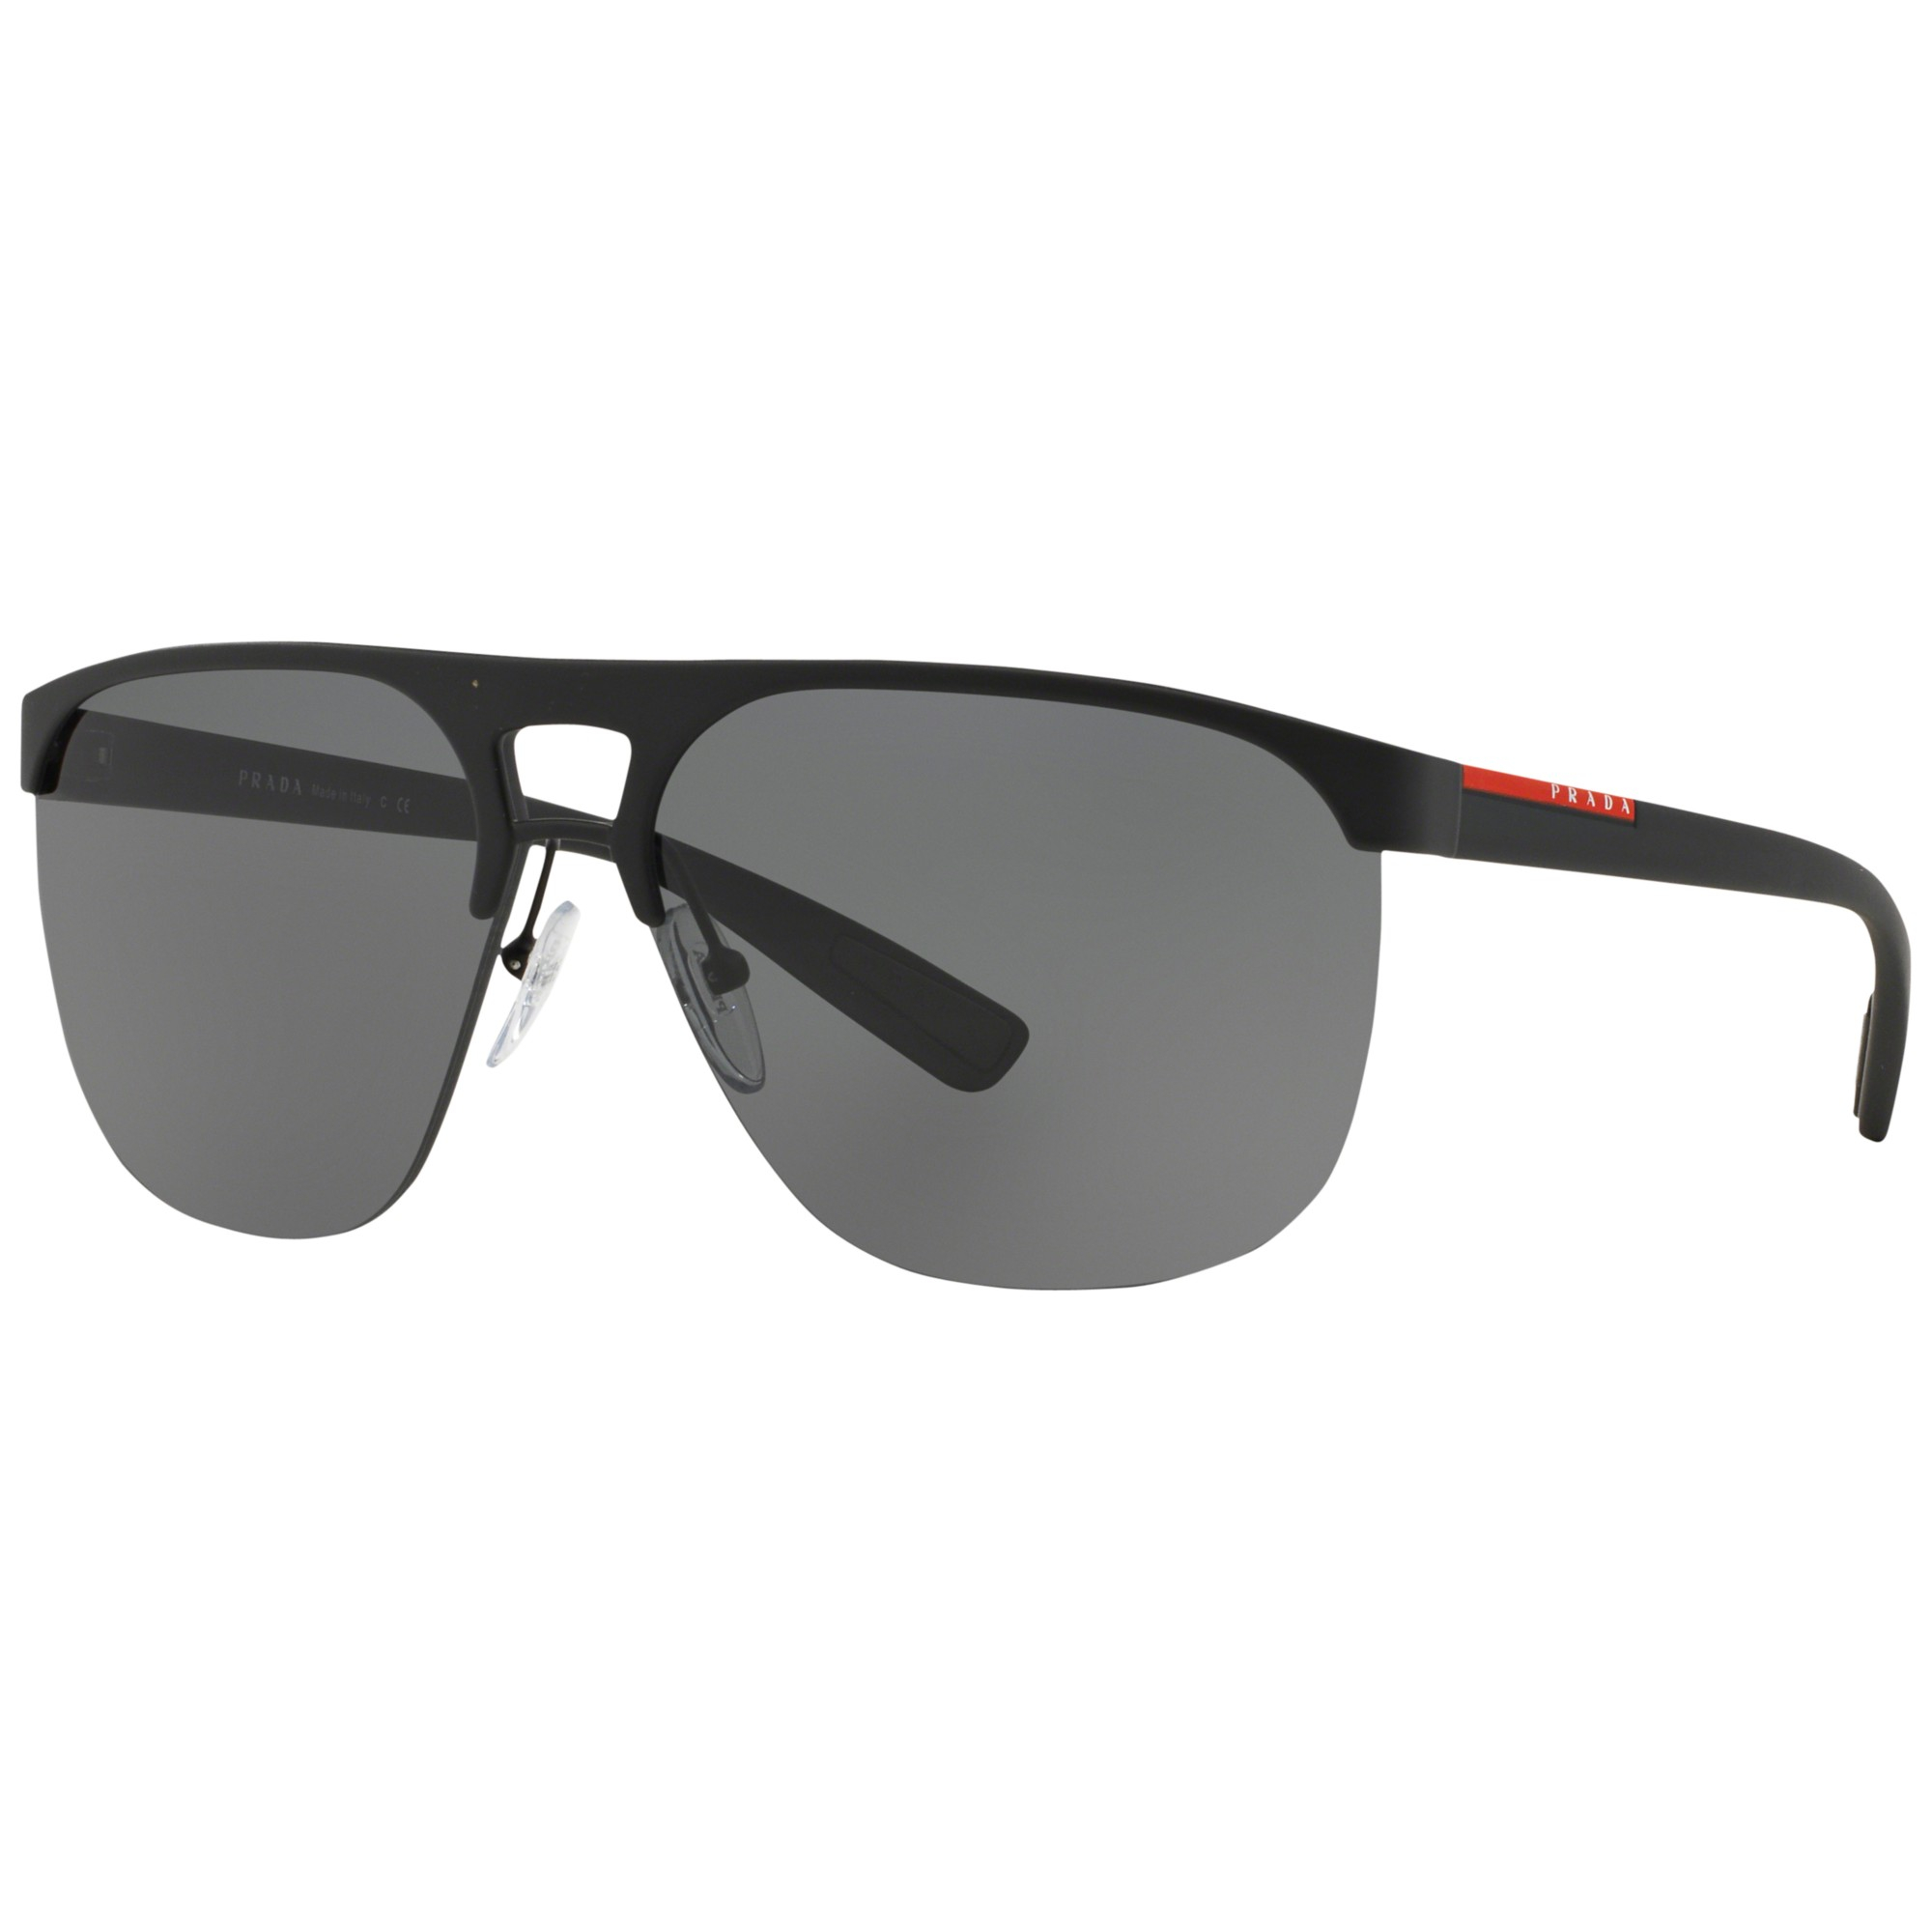 Prada Ps 53q D-frame Sunglasses in Black - Lyst